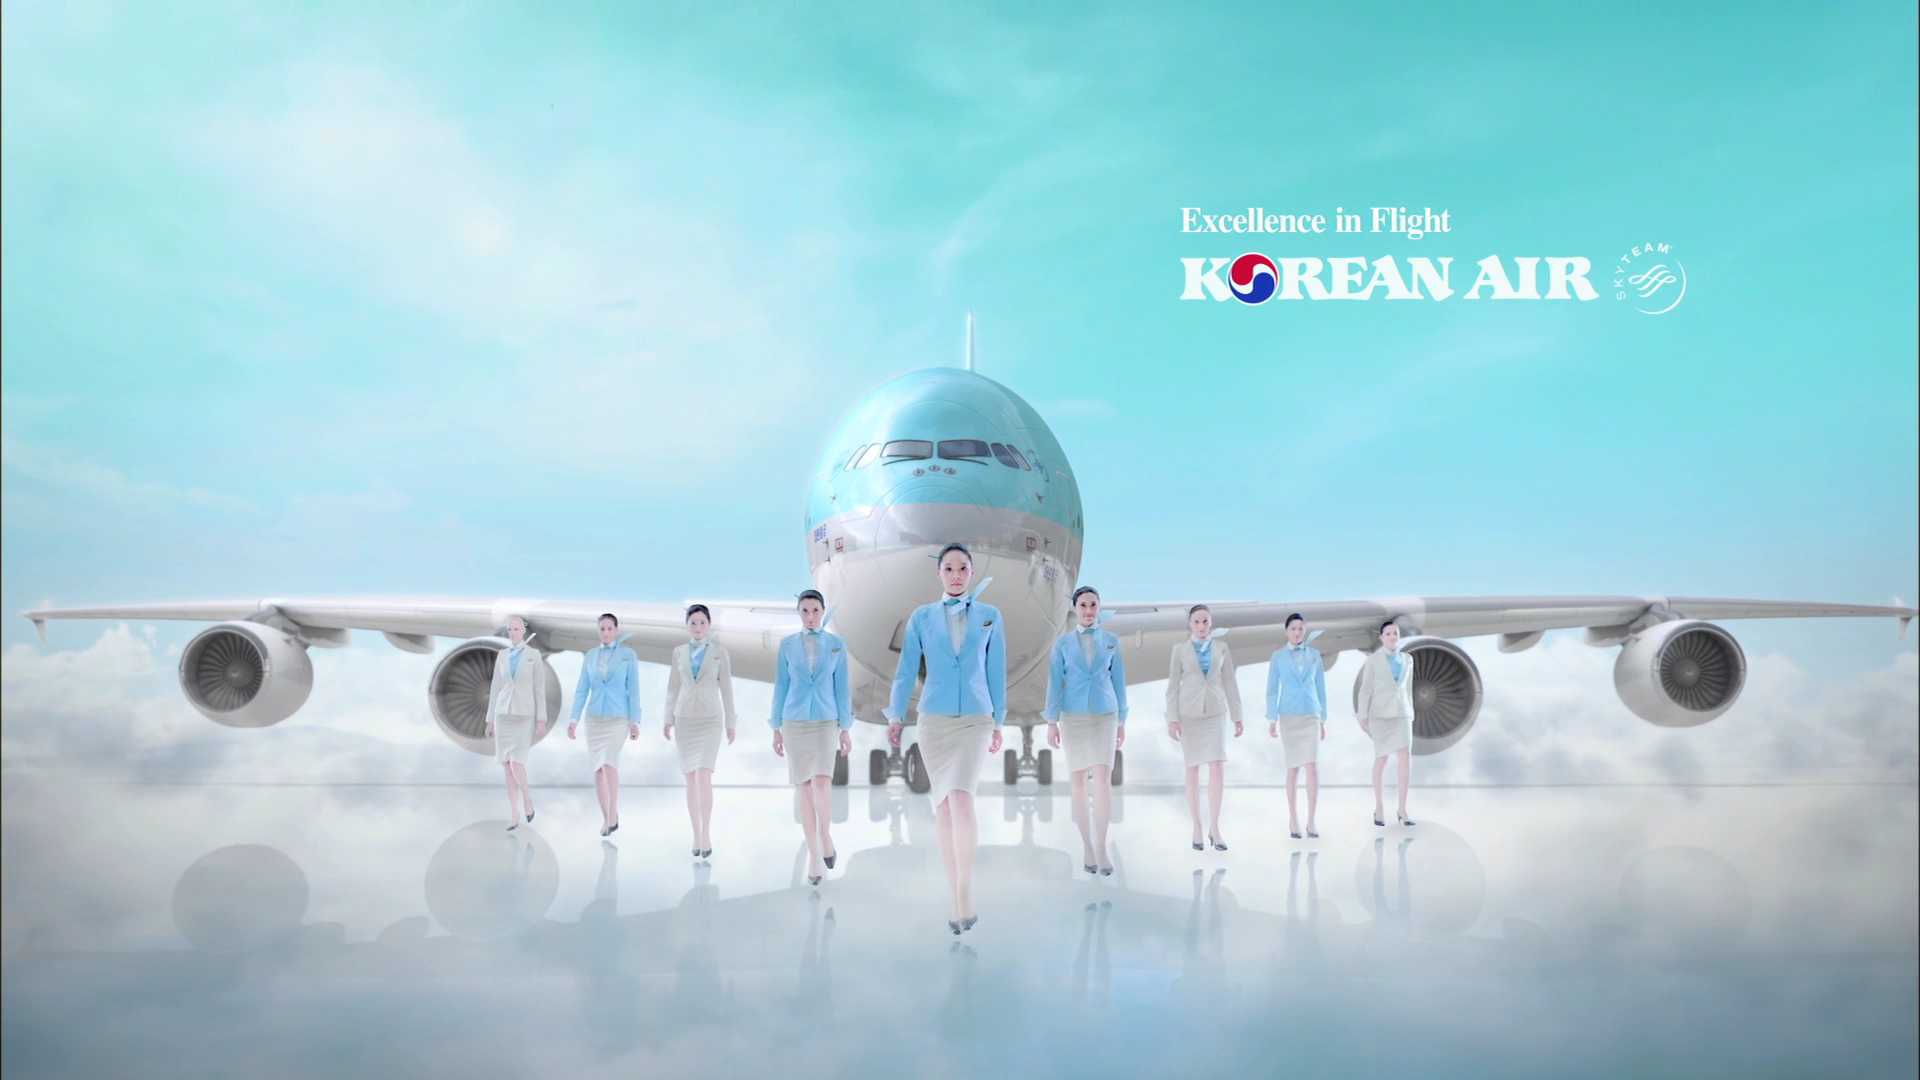 Hàng hàng không Korean Air